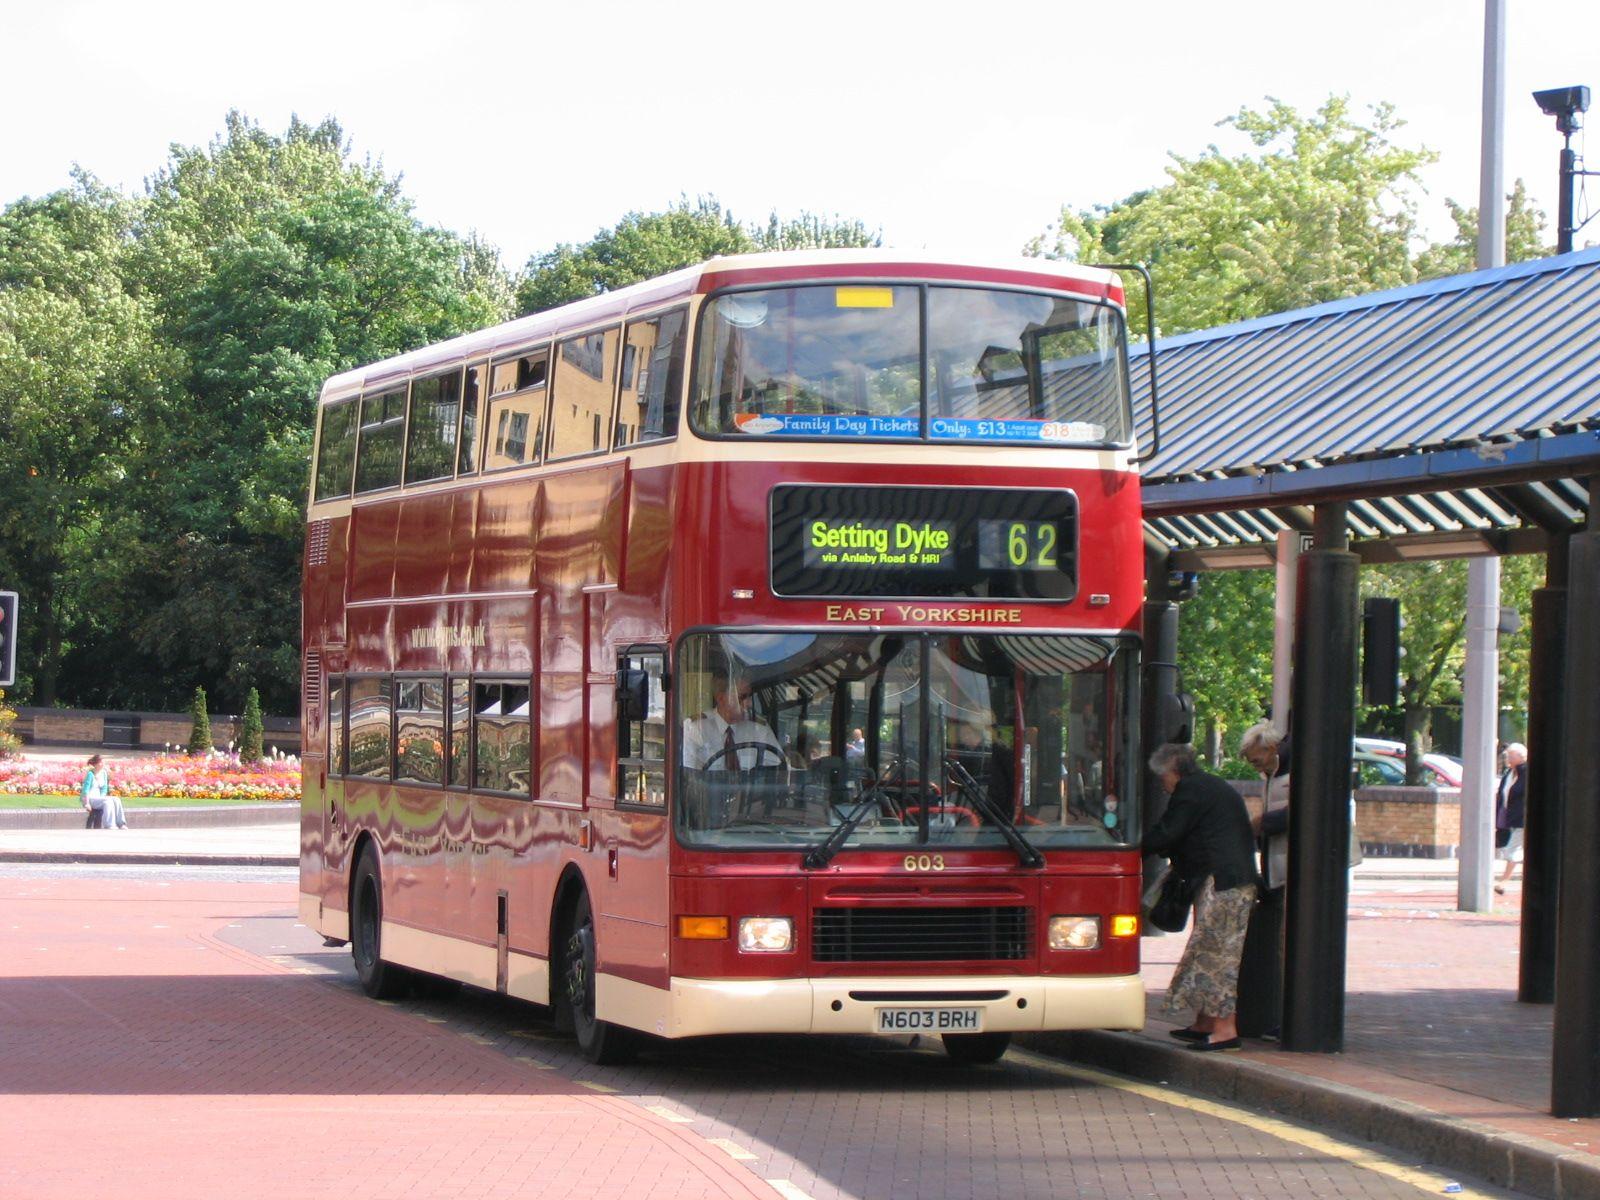 [367]bus 603 010808.jpg (1600×1200)